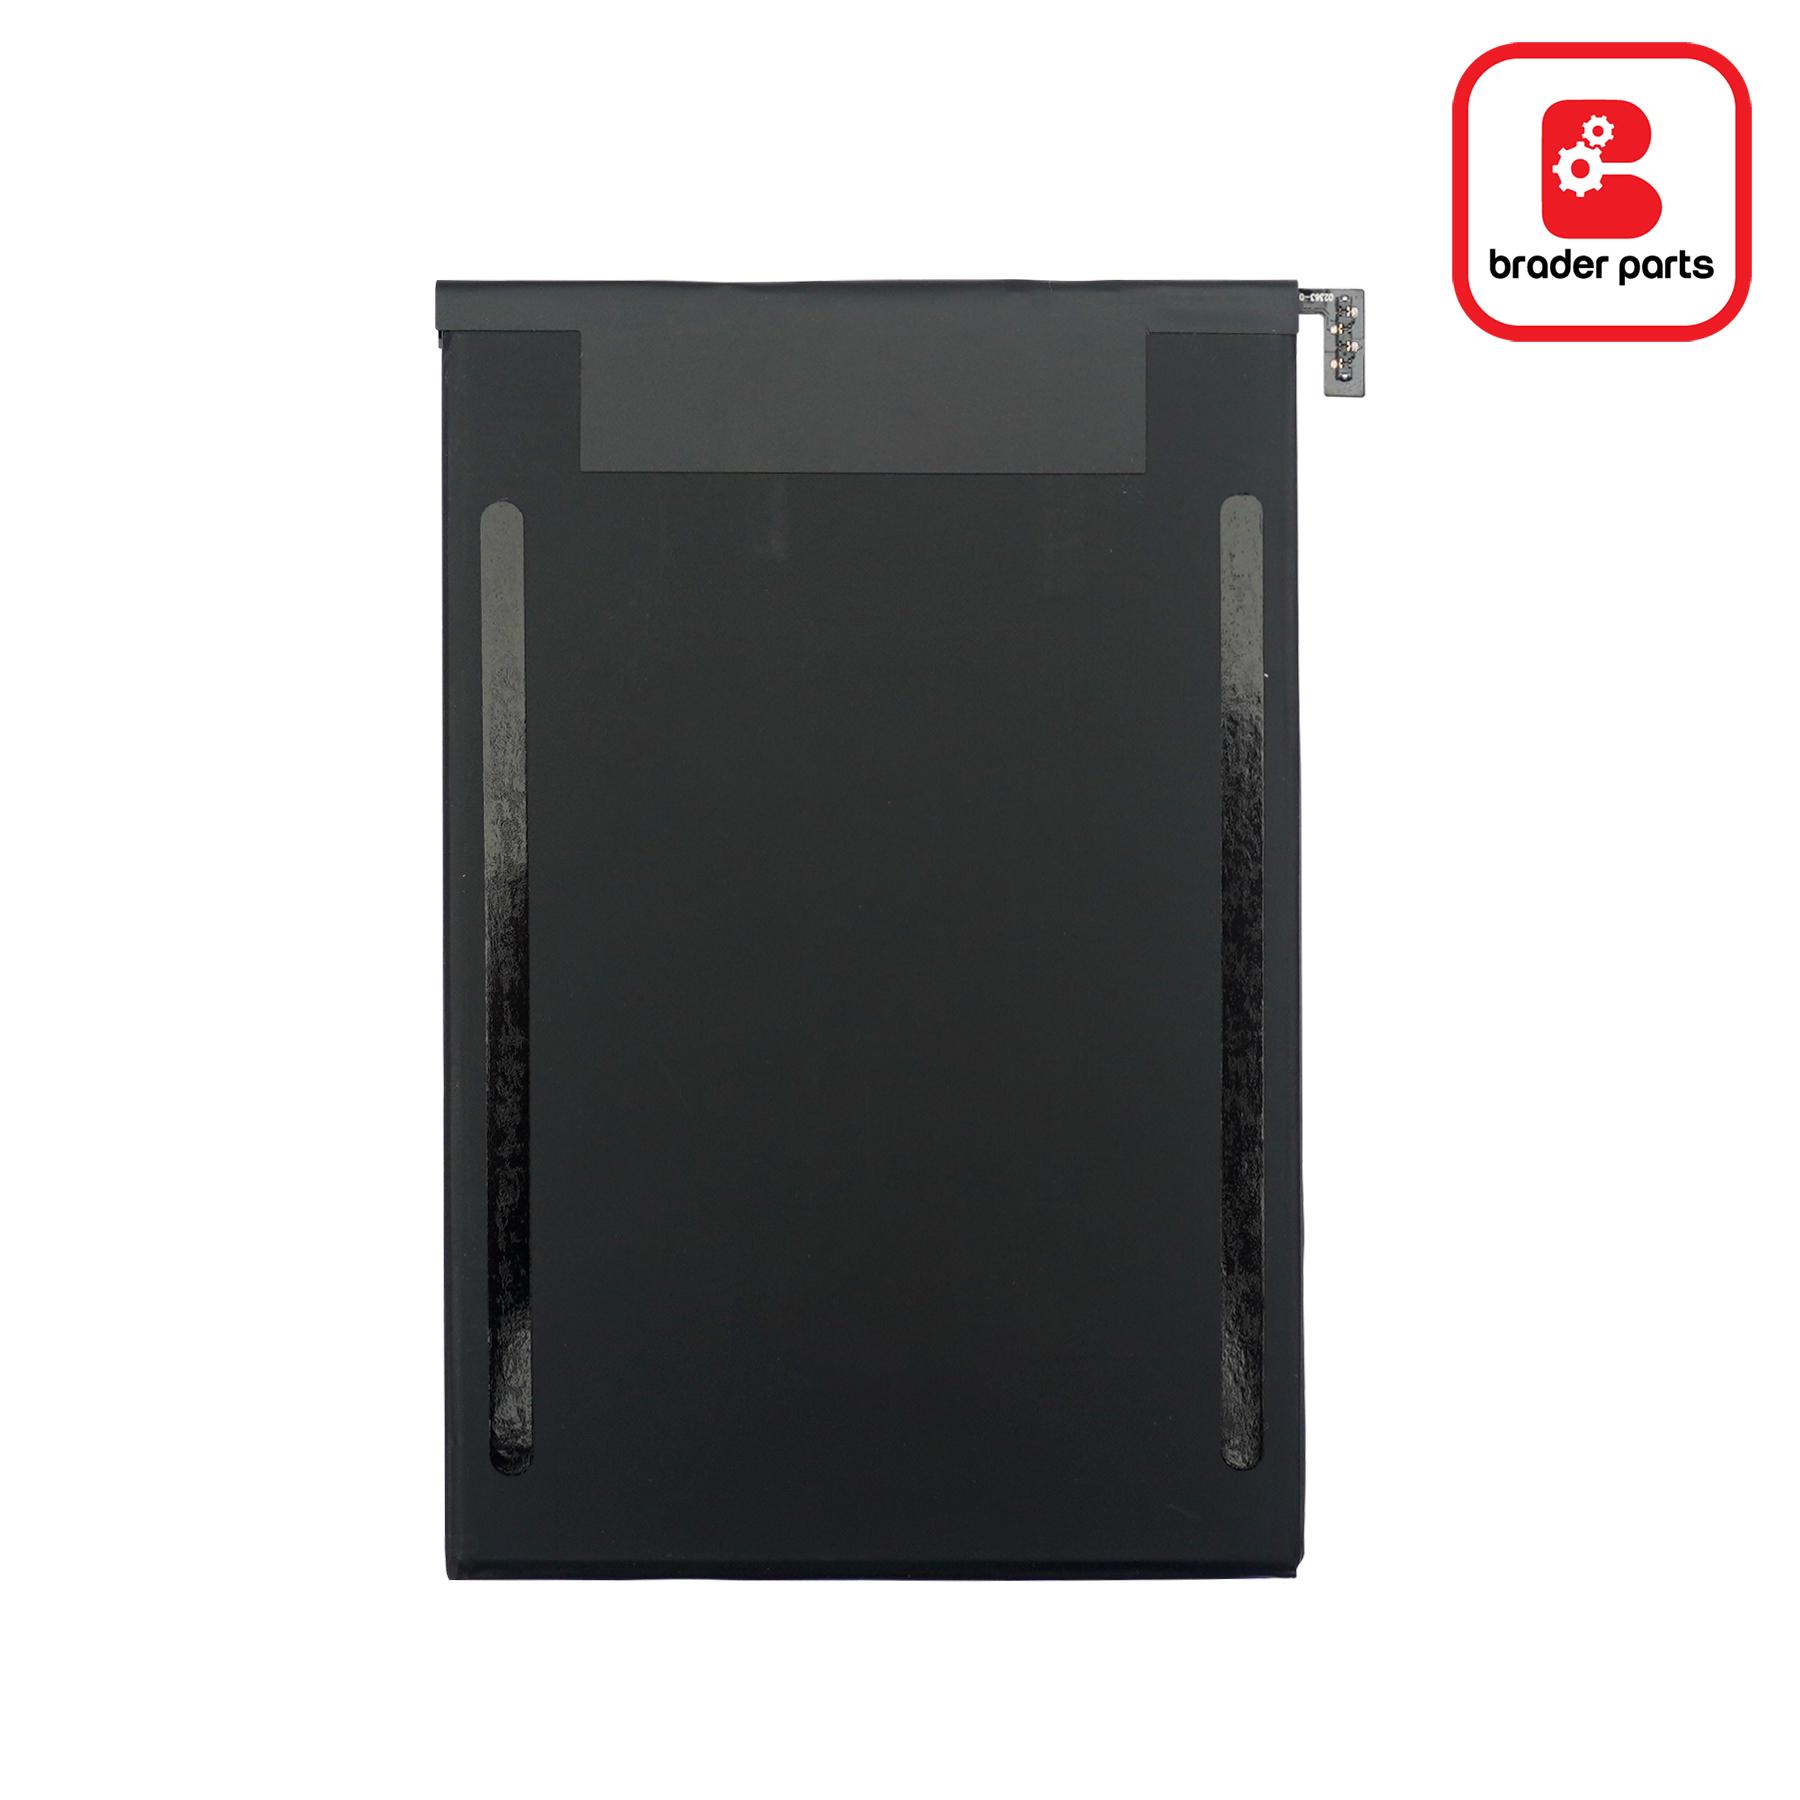 Baterai iPad Mini 5 / A2126 / A2124 / A2133